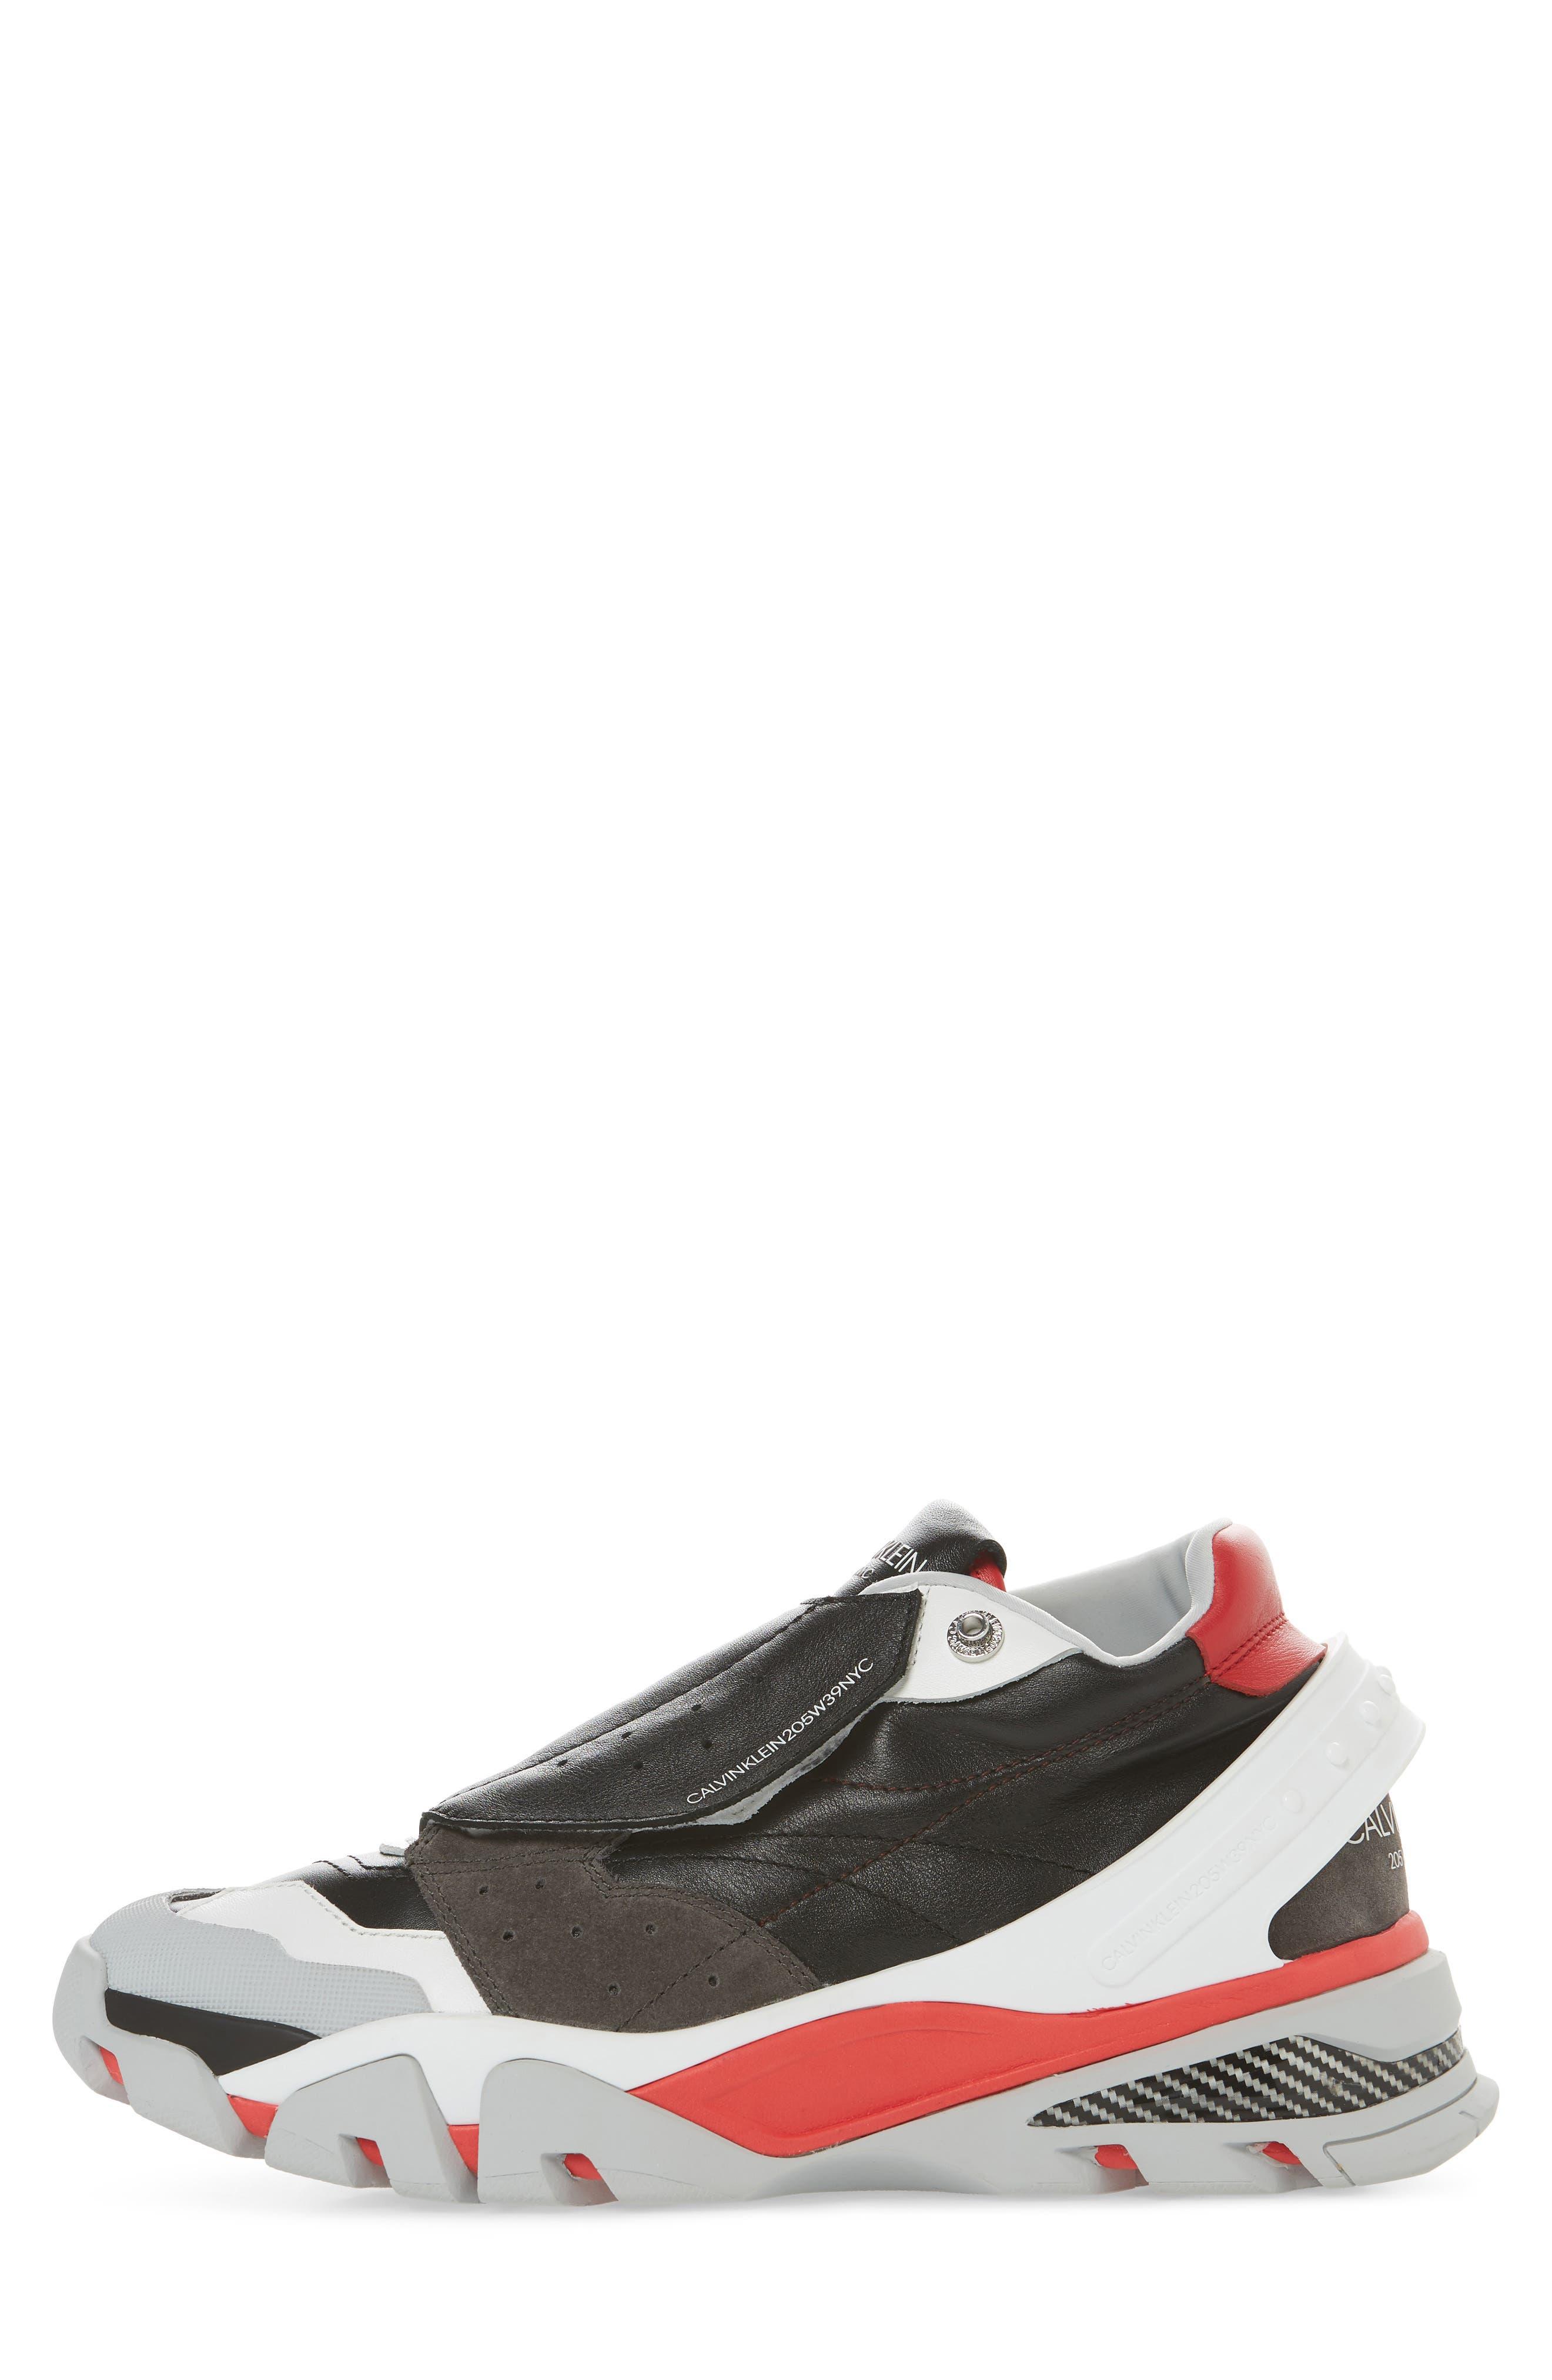 Cander 7 Sneaker,                             Alternate thumbnail 3, color,                             BLACK/ WHITE/ RED/ GREY